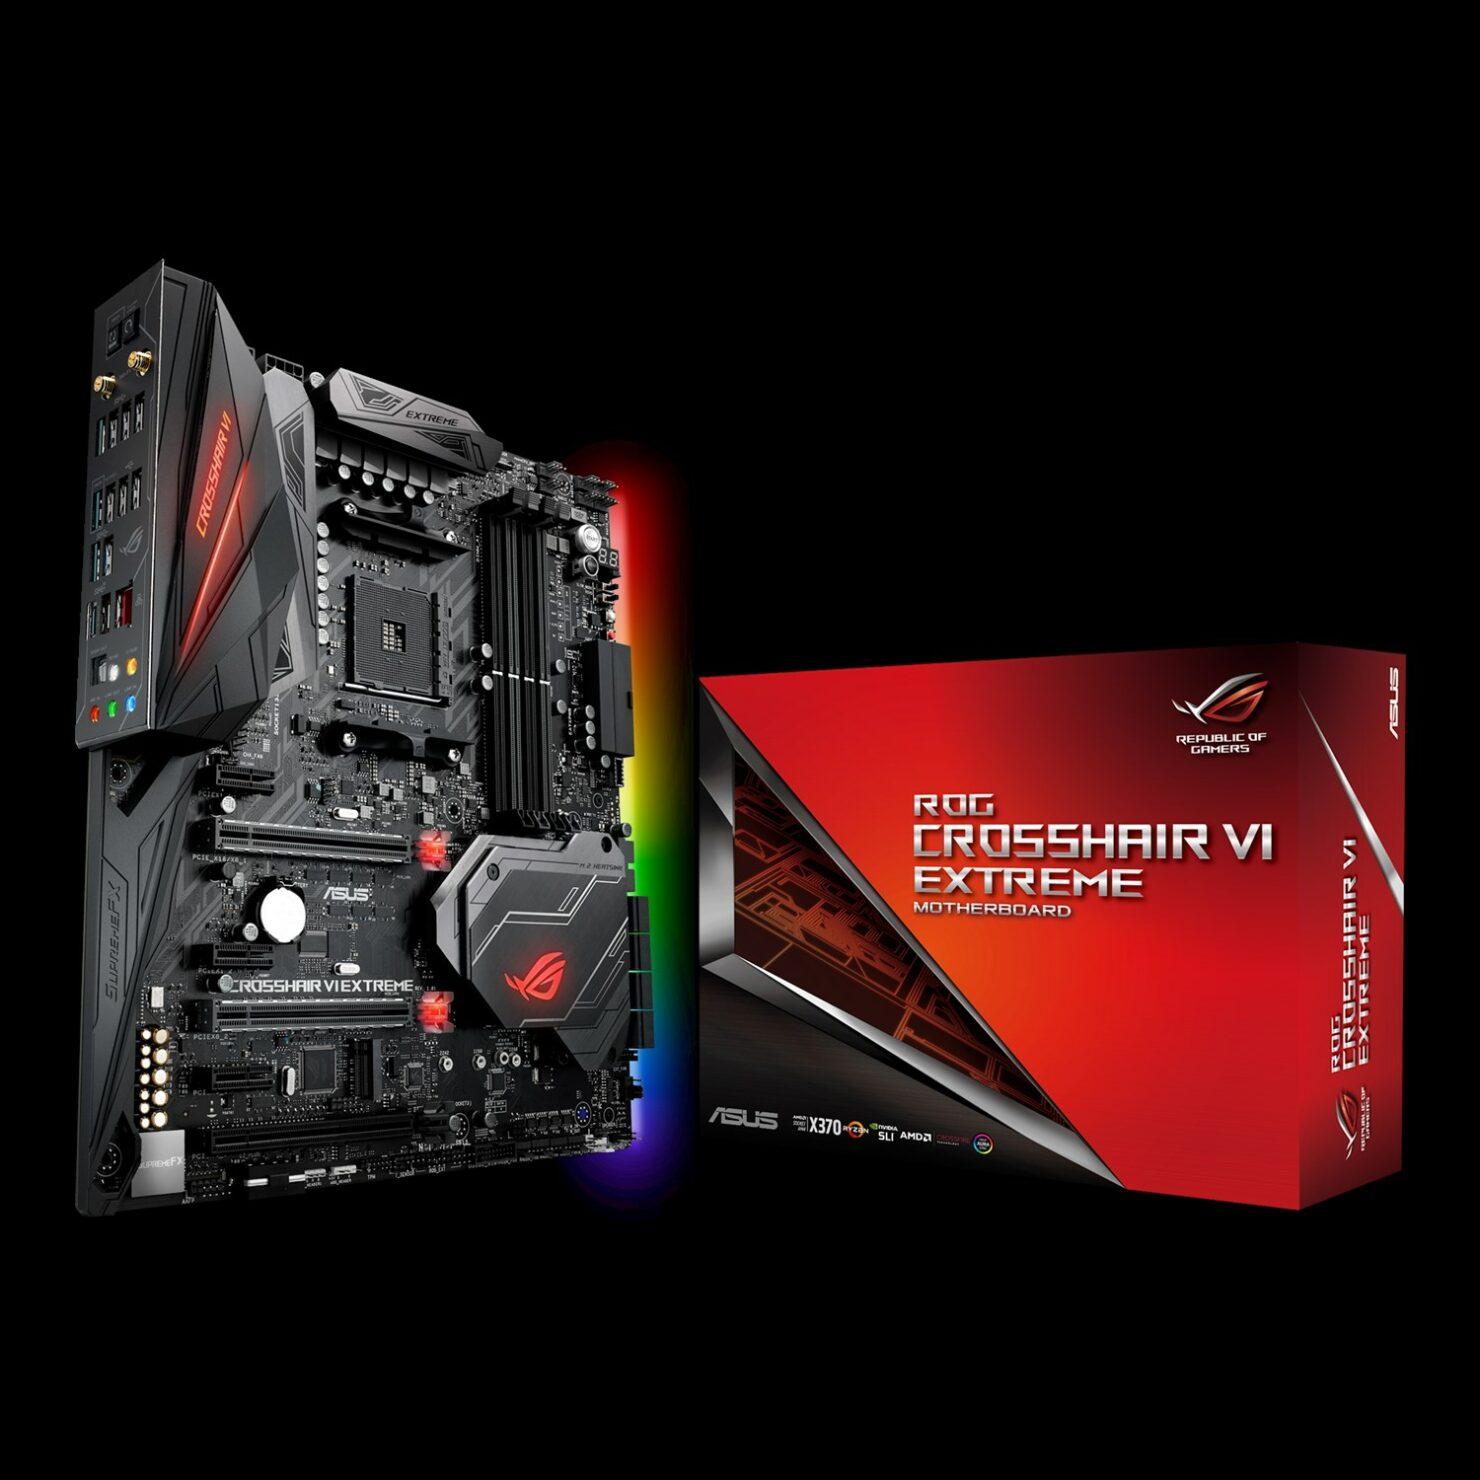 asus-rog-crosshair-vi-extreme-x370-motherboard_1-2